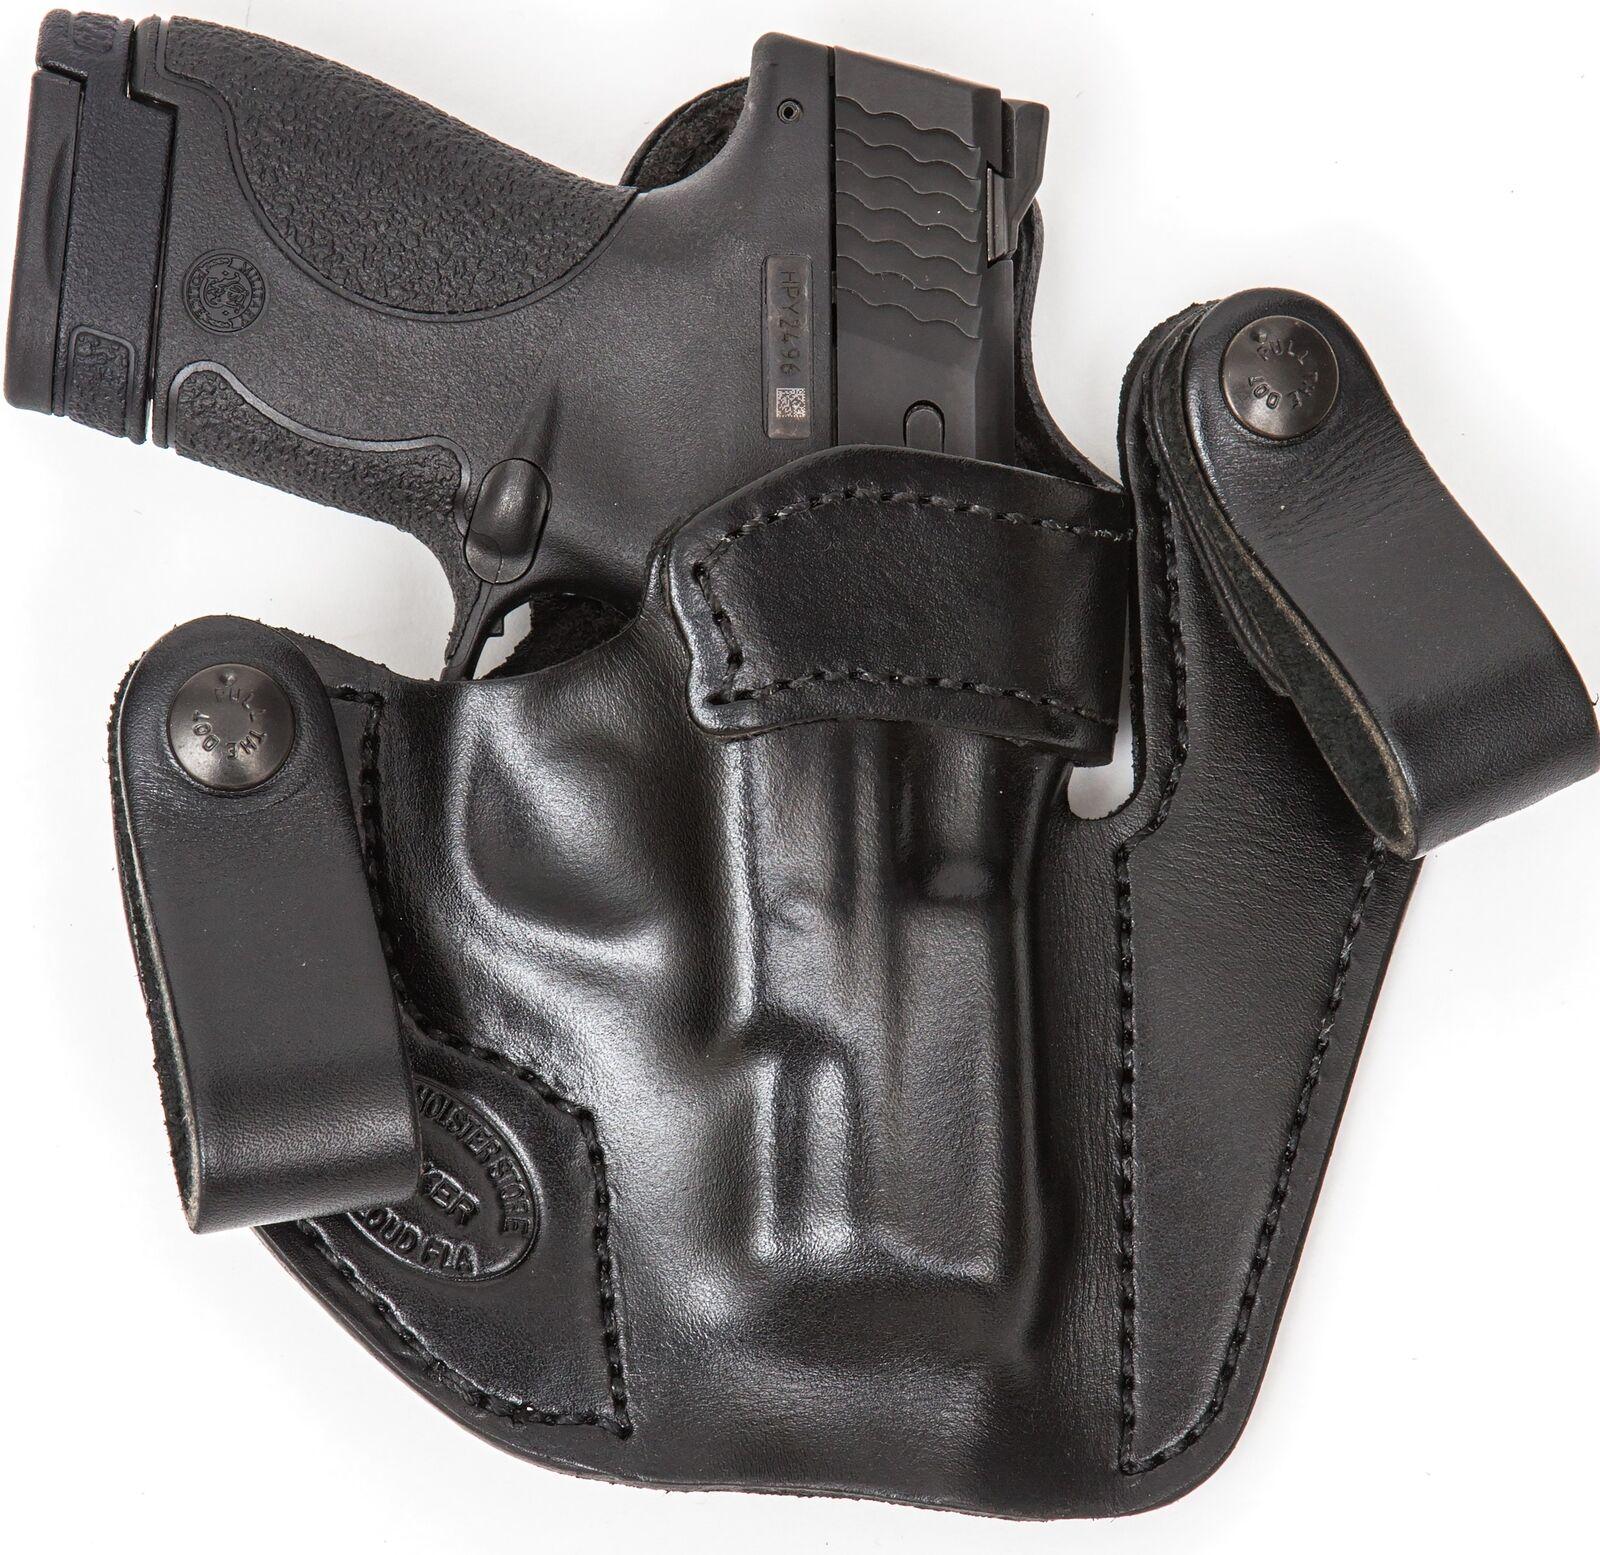 Xtreme llevar RH LH IWB Cuero Funda Pistola para 1911 3 pulgadas